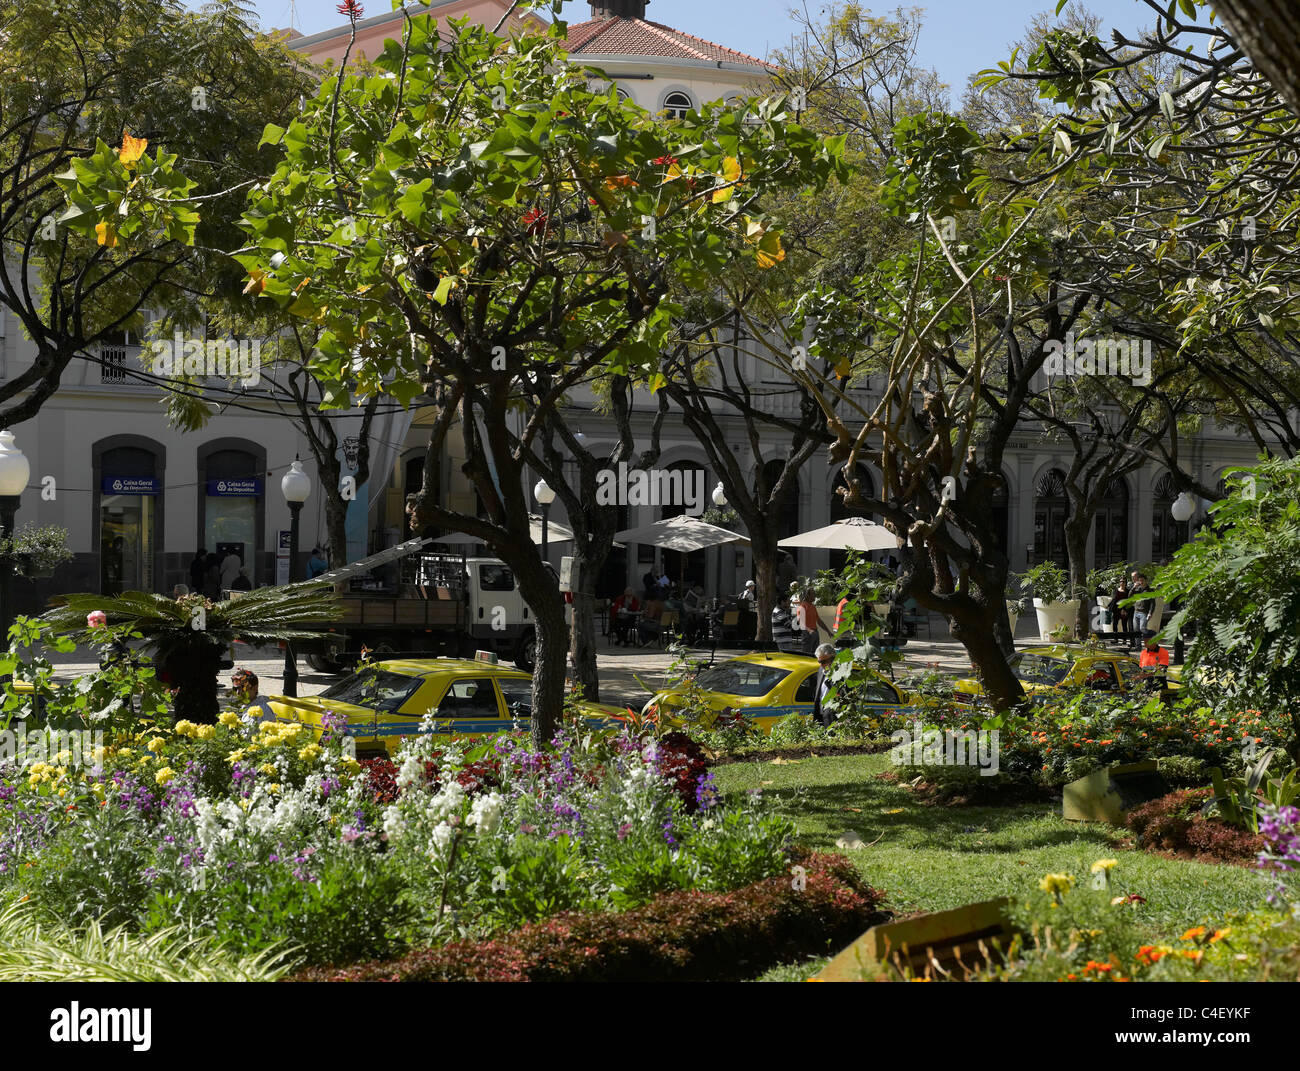 Good Jardim Municipal Gardens Funchal Madeira Portugal EU Europe   Stock Image